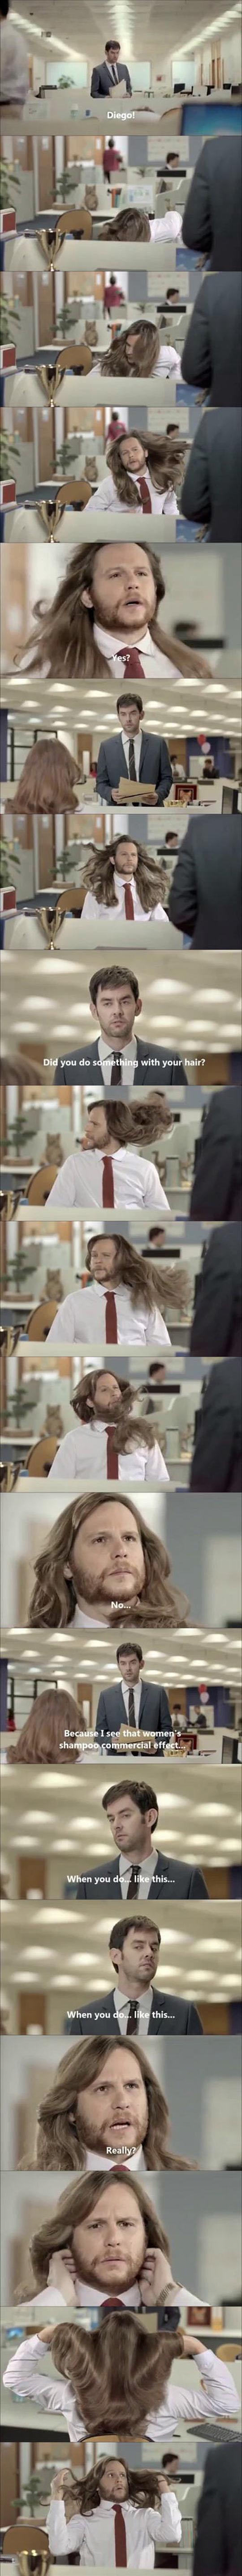 When Men Use Shampoo For Women